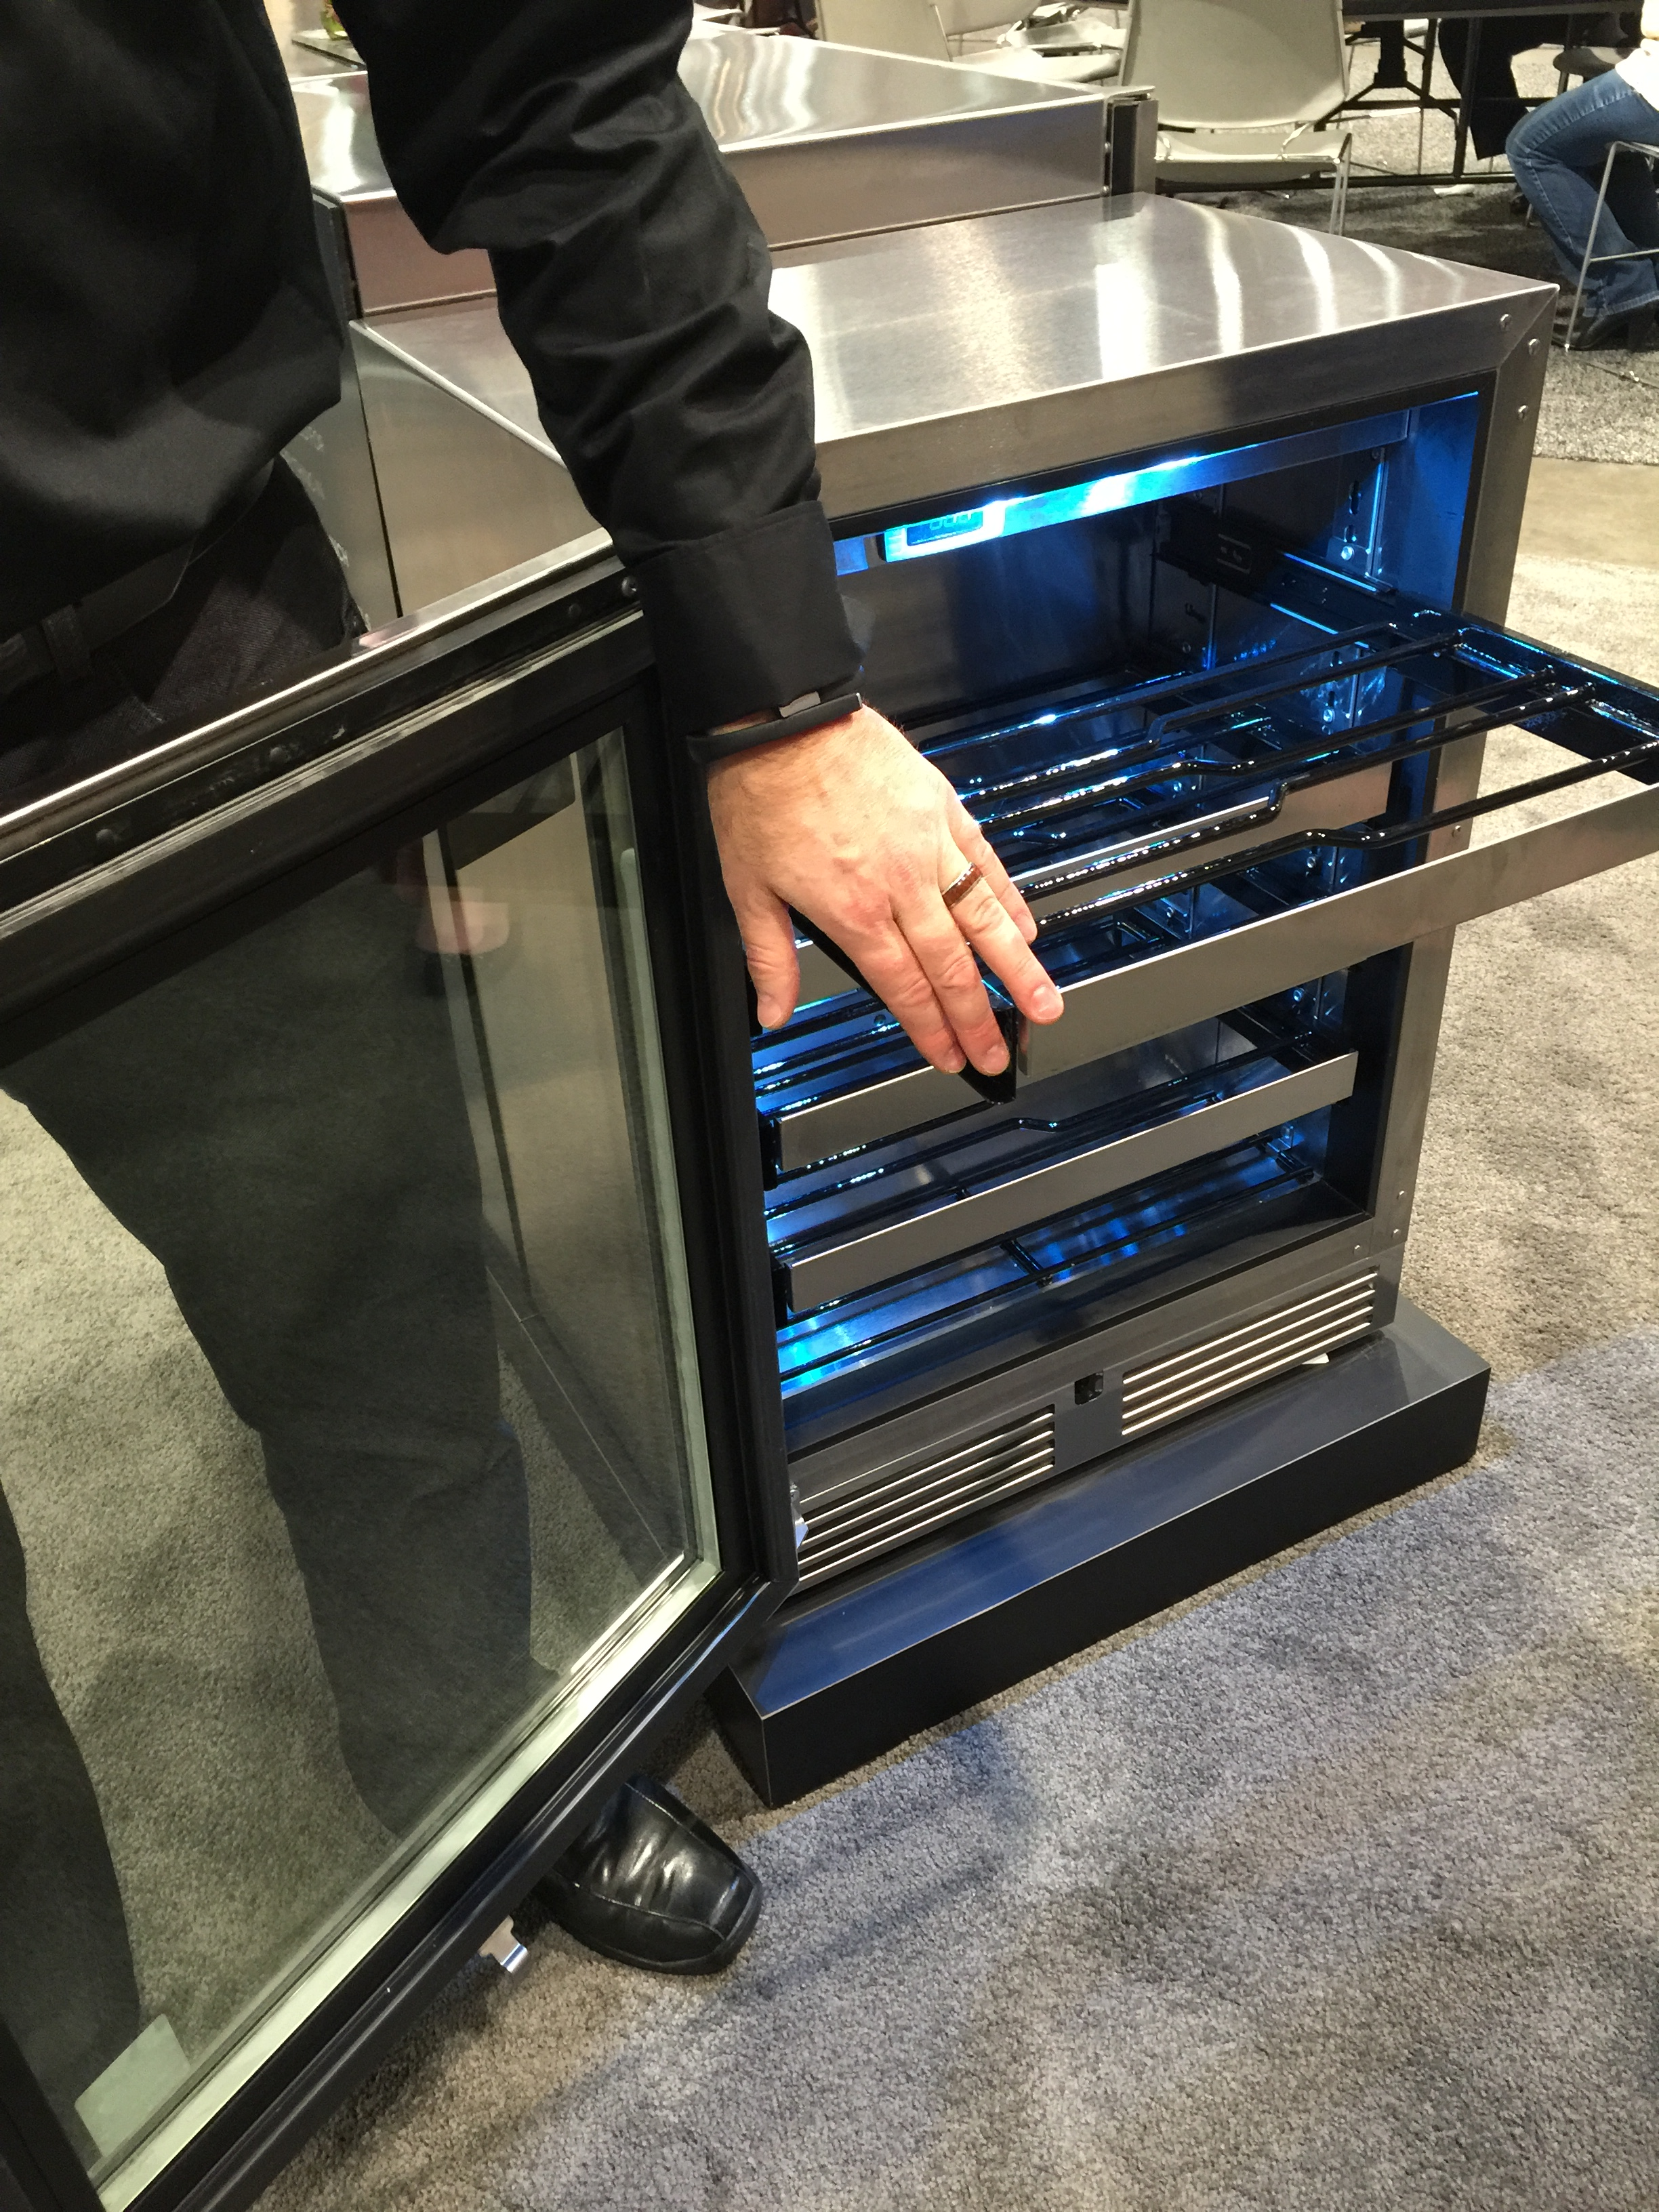 Perlick undercounter refrigeration